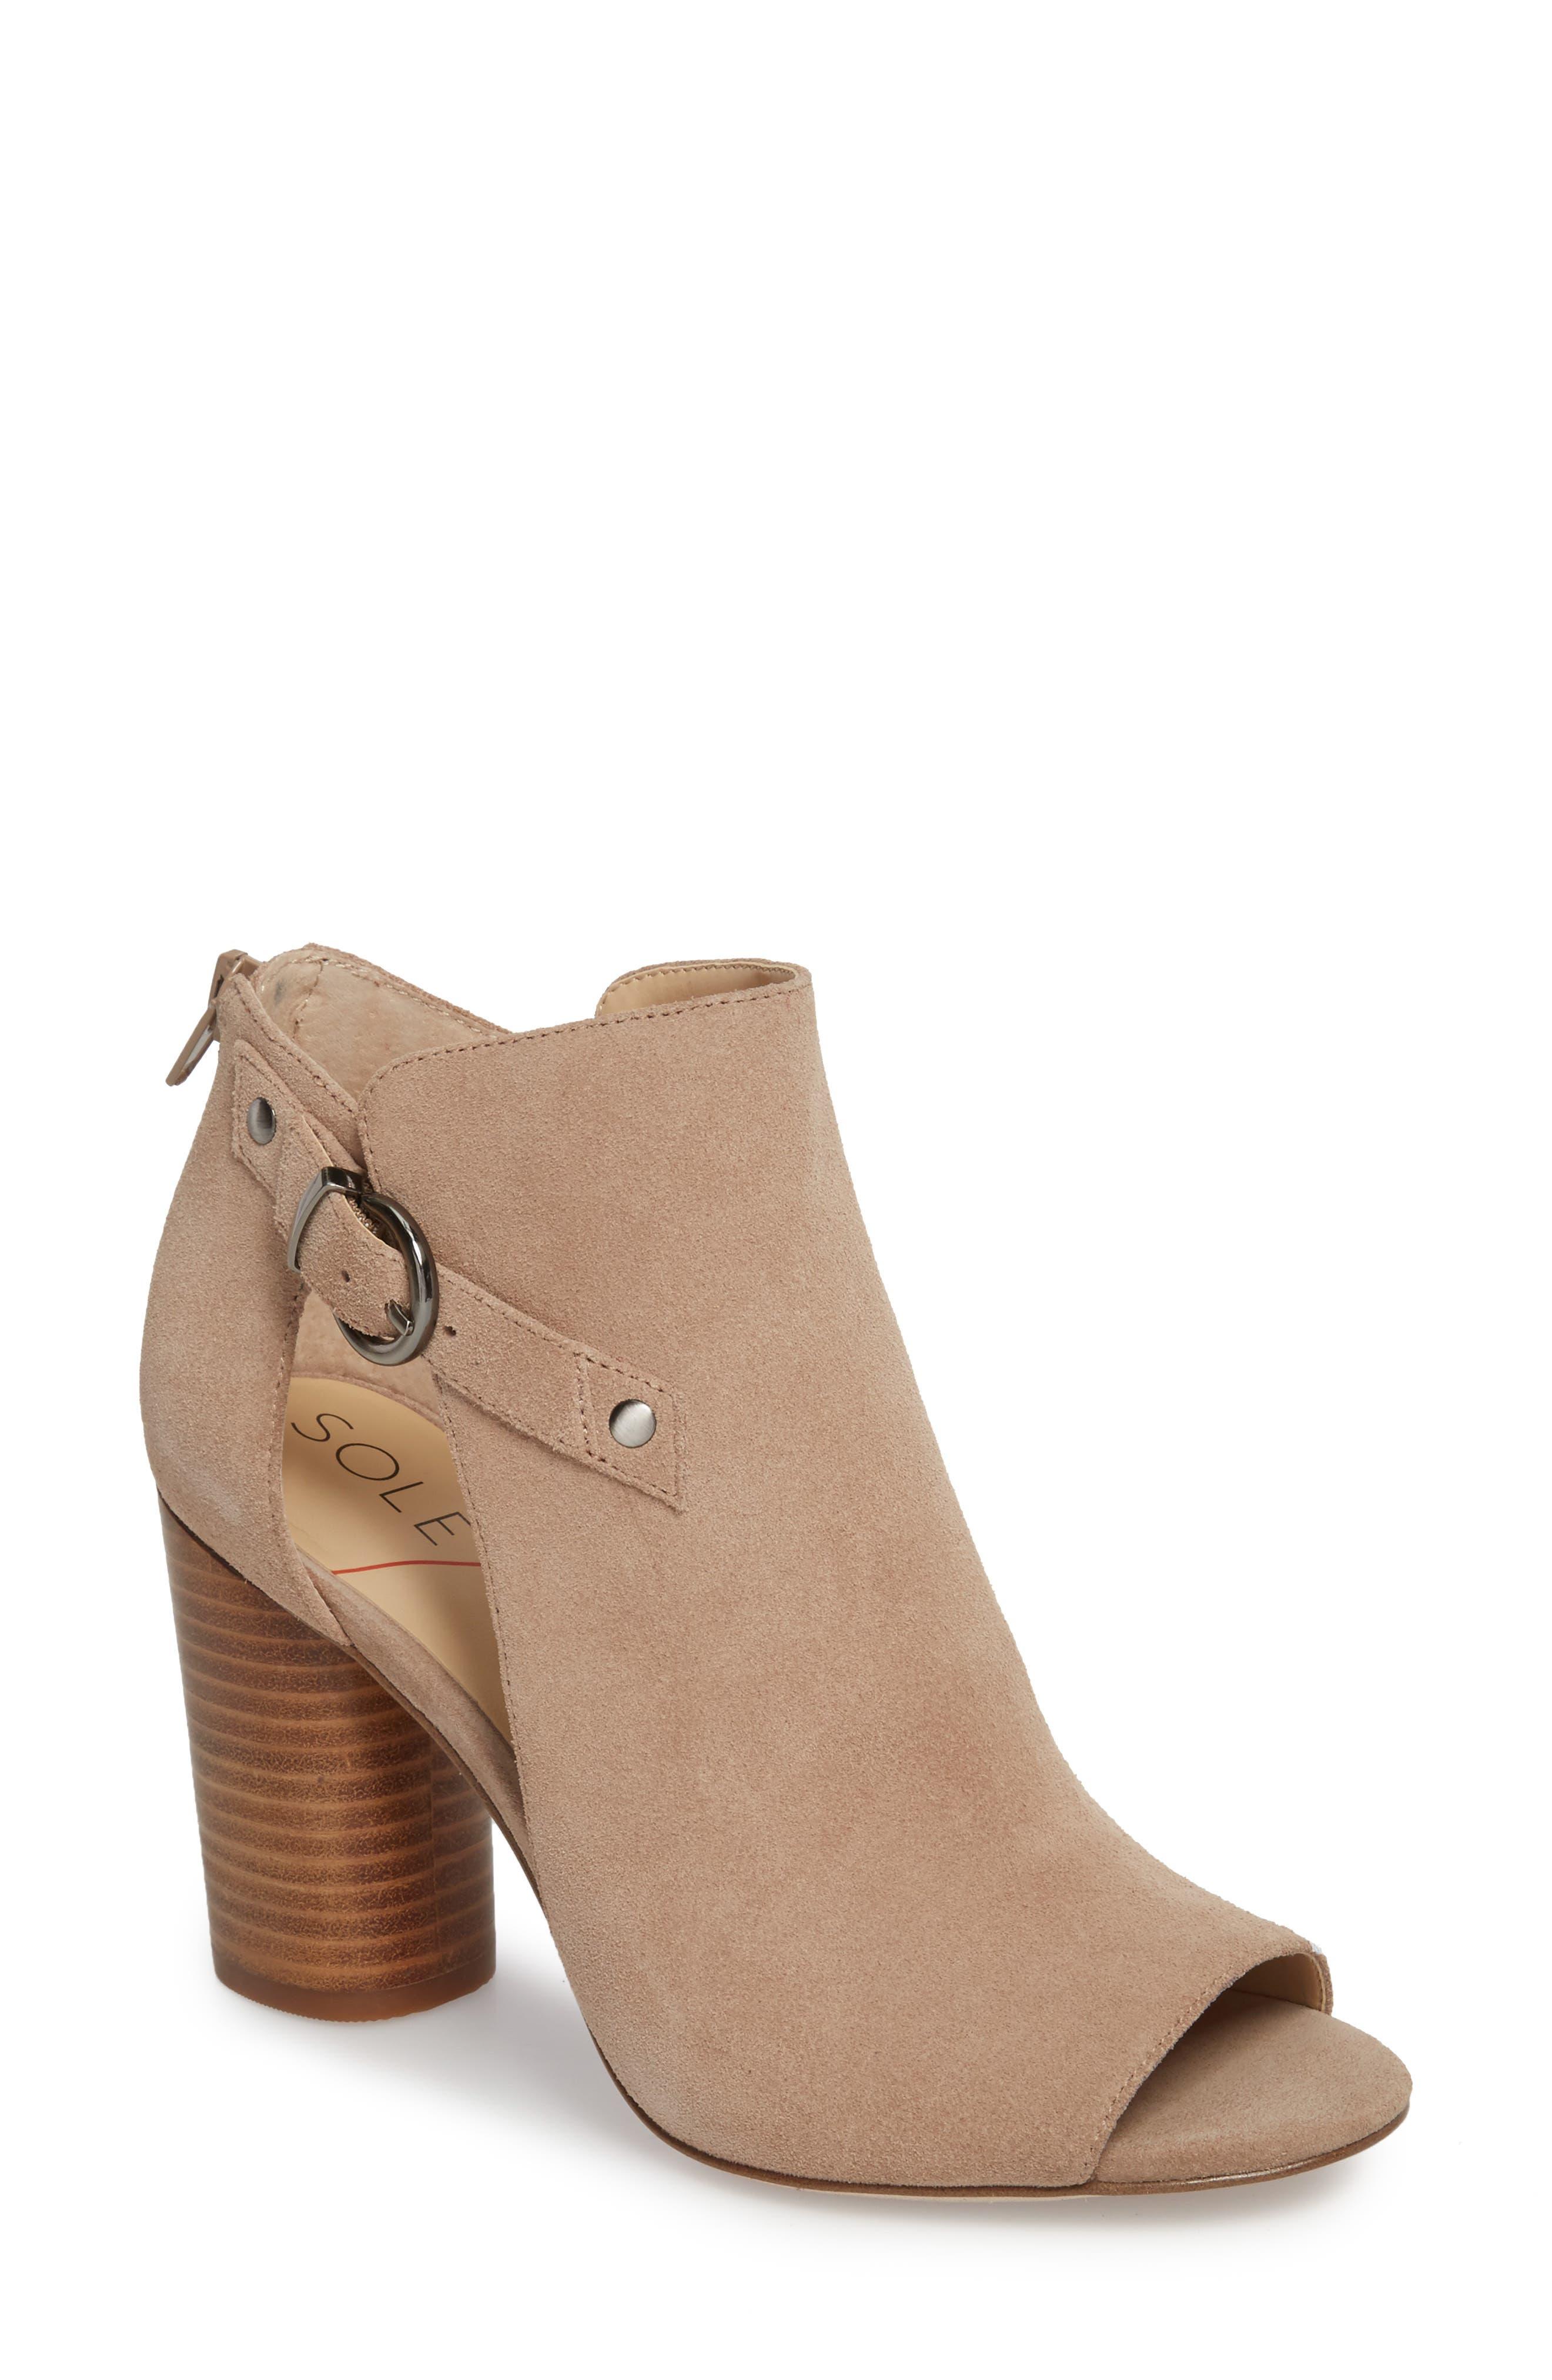 Sally Column Heel Sandal,                         Main,                         color, 200